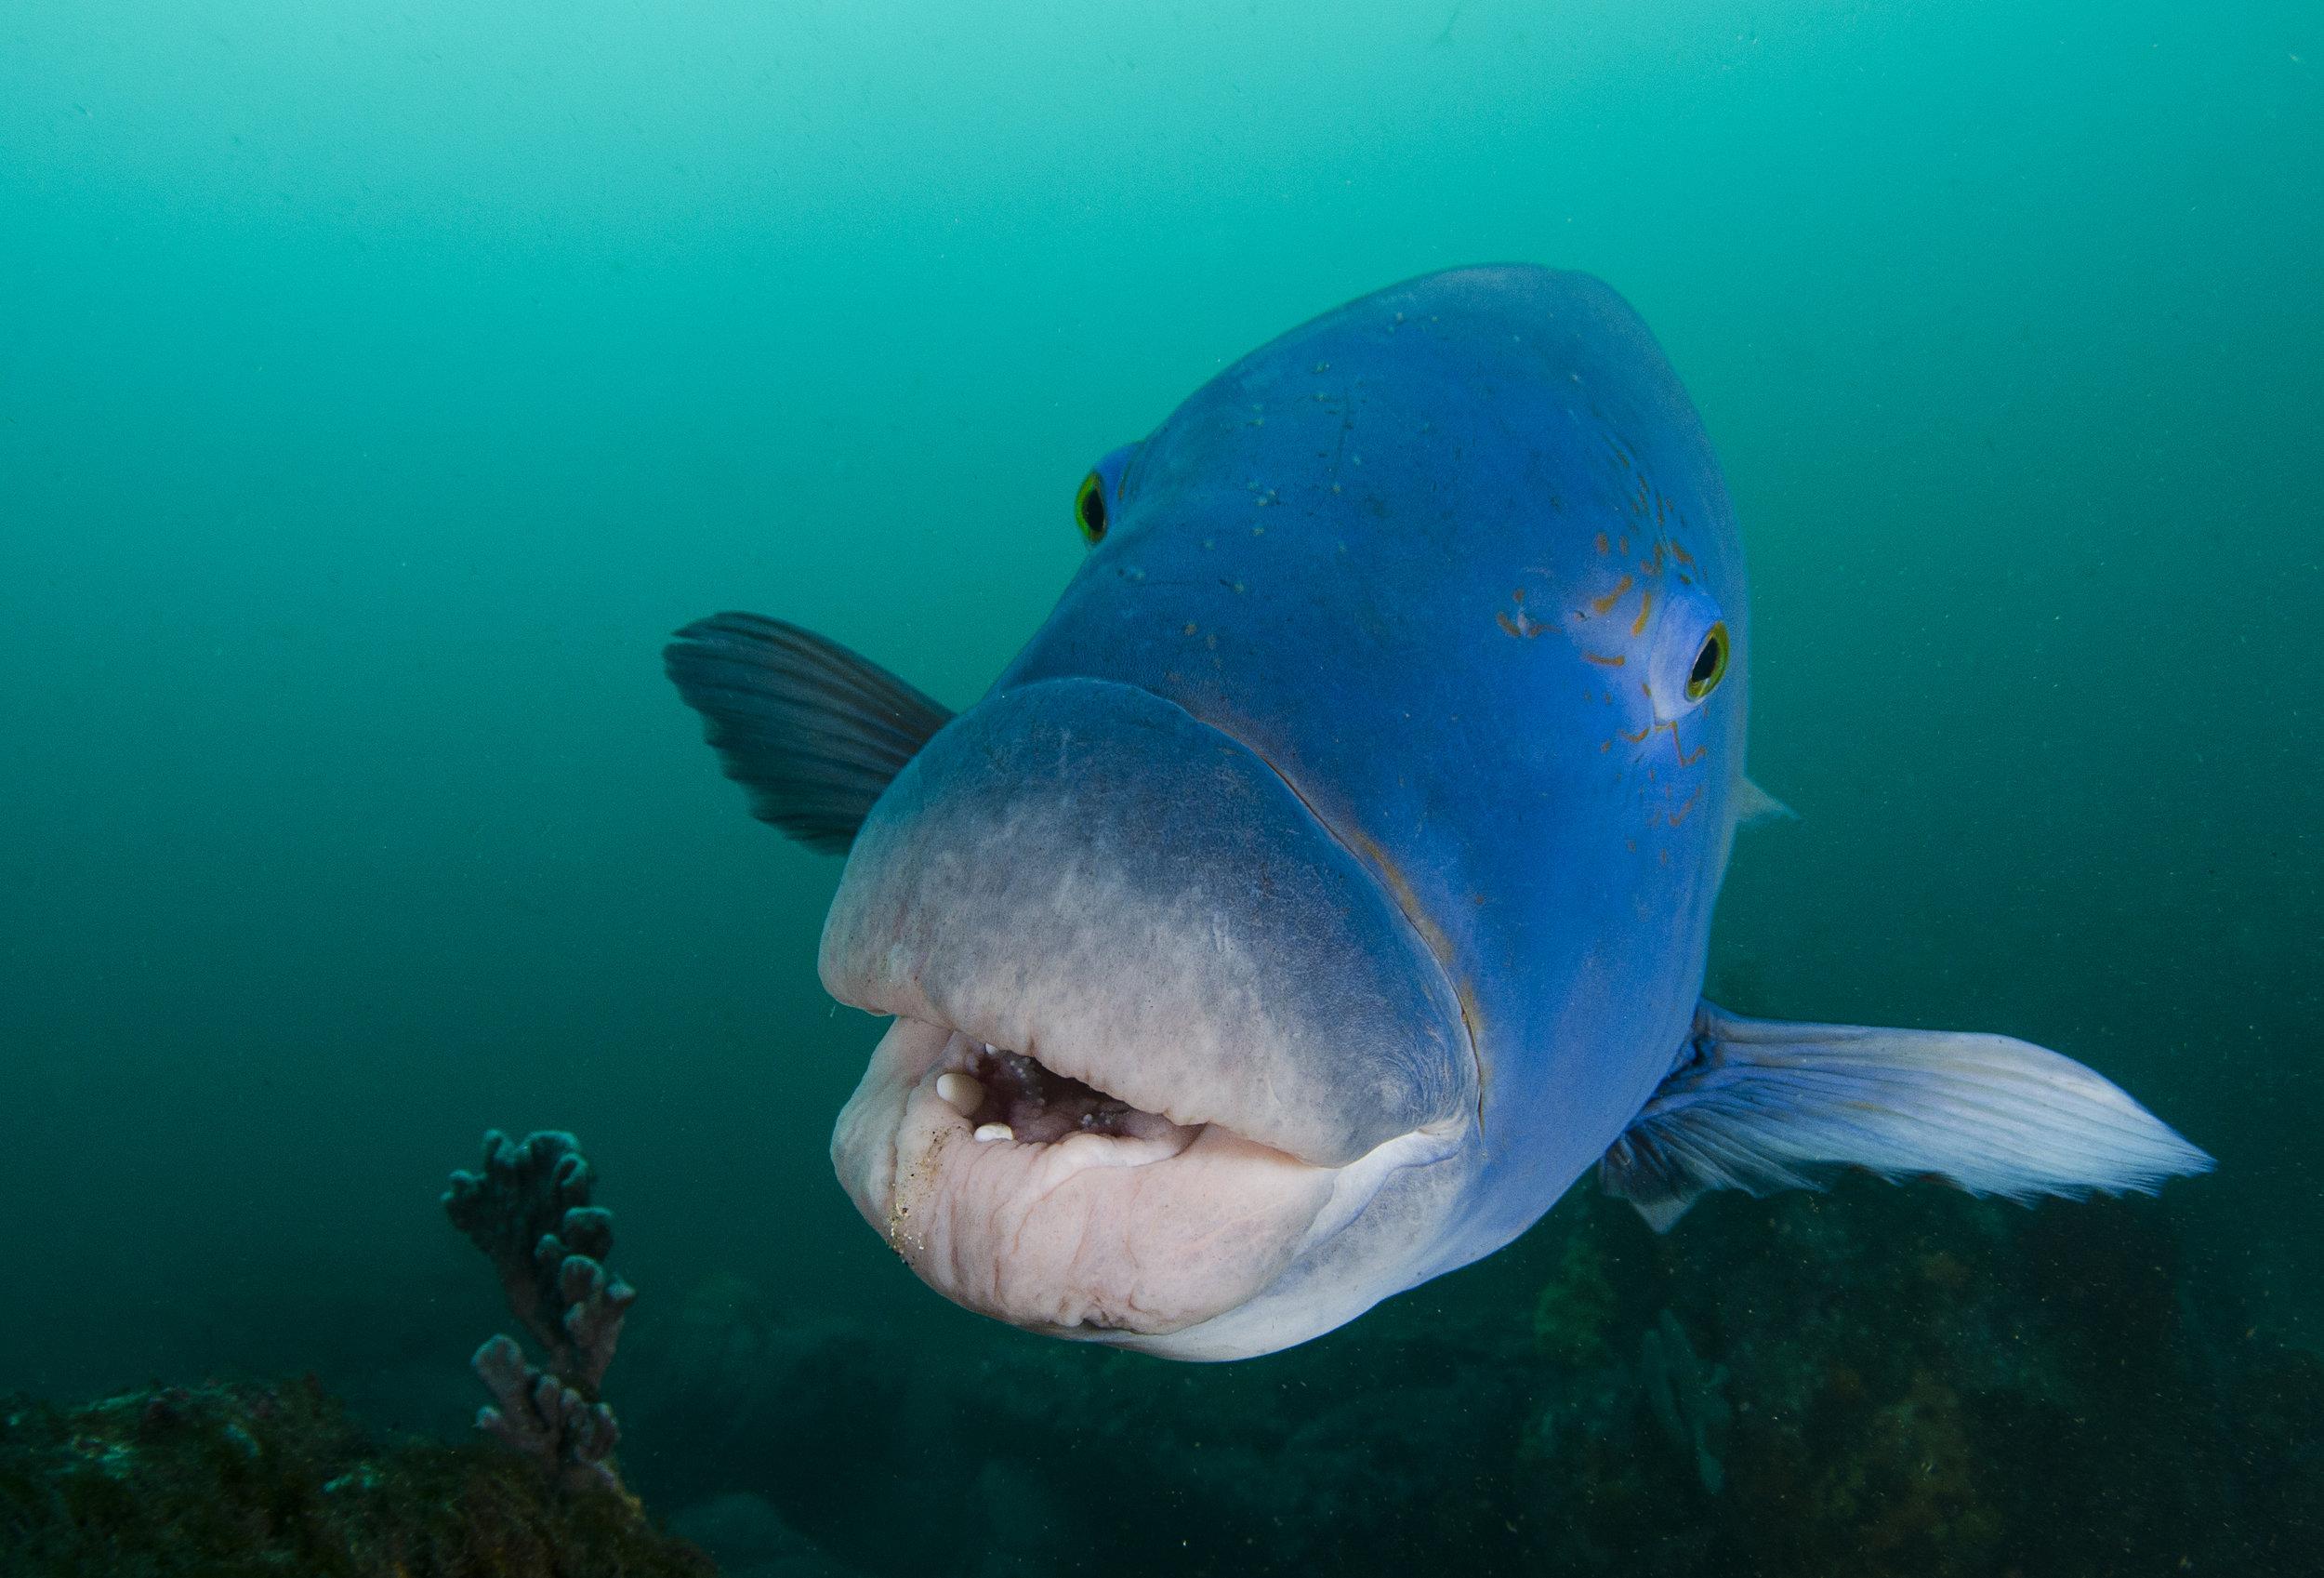 blue wrasse credit: amanda cotton / coral reef image bank